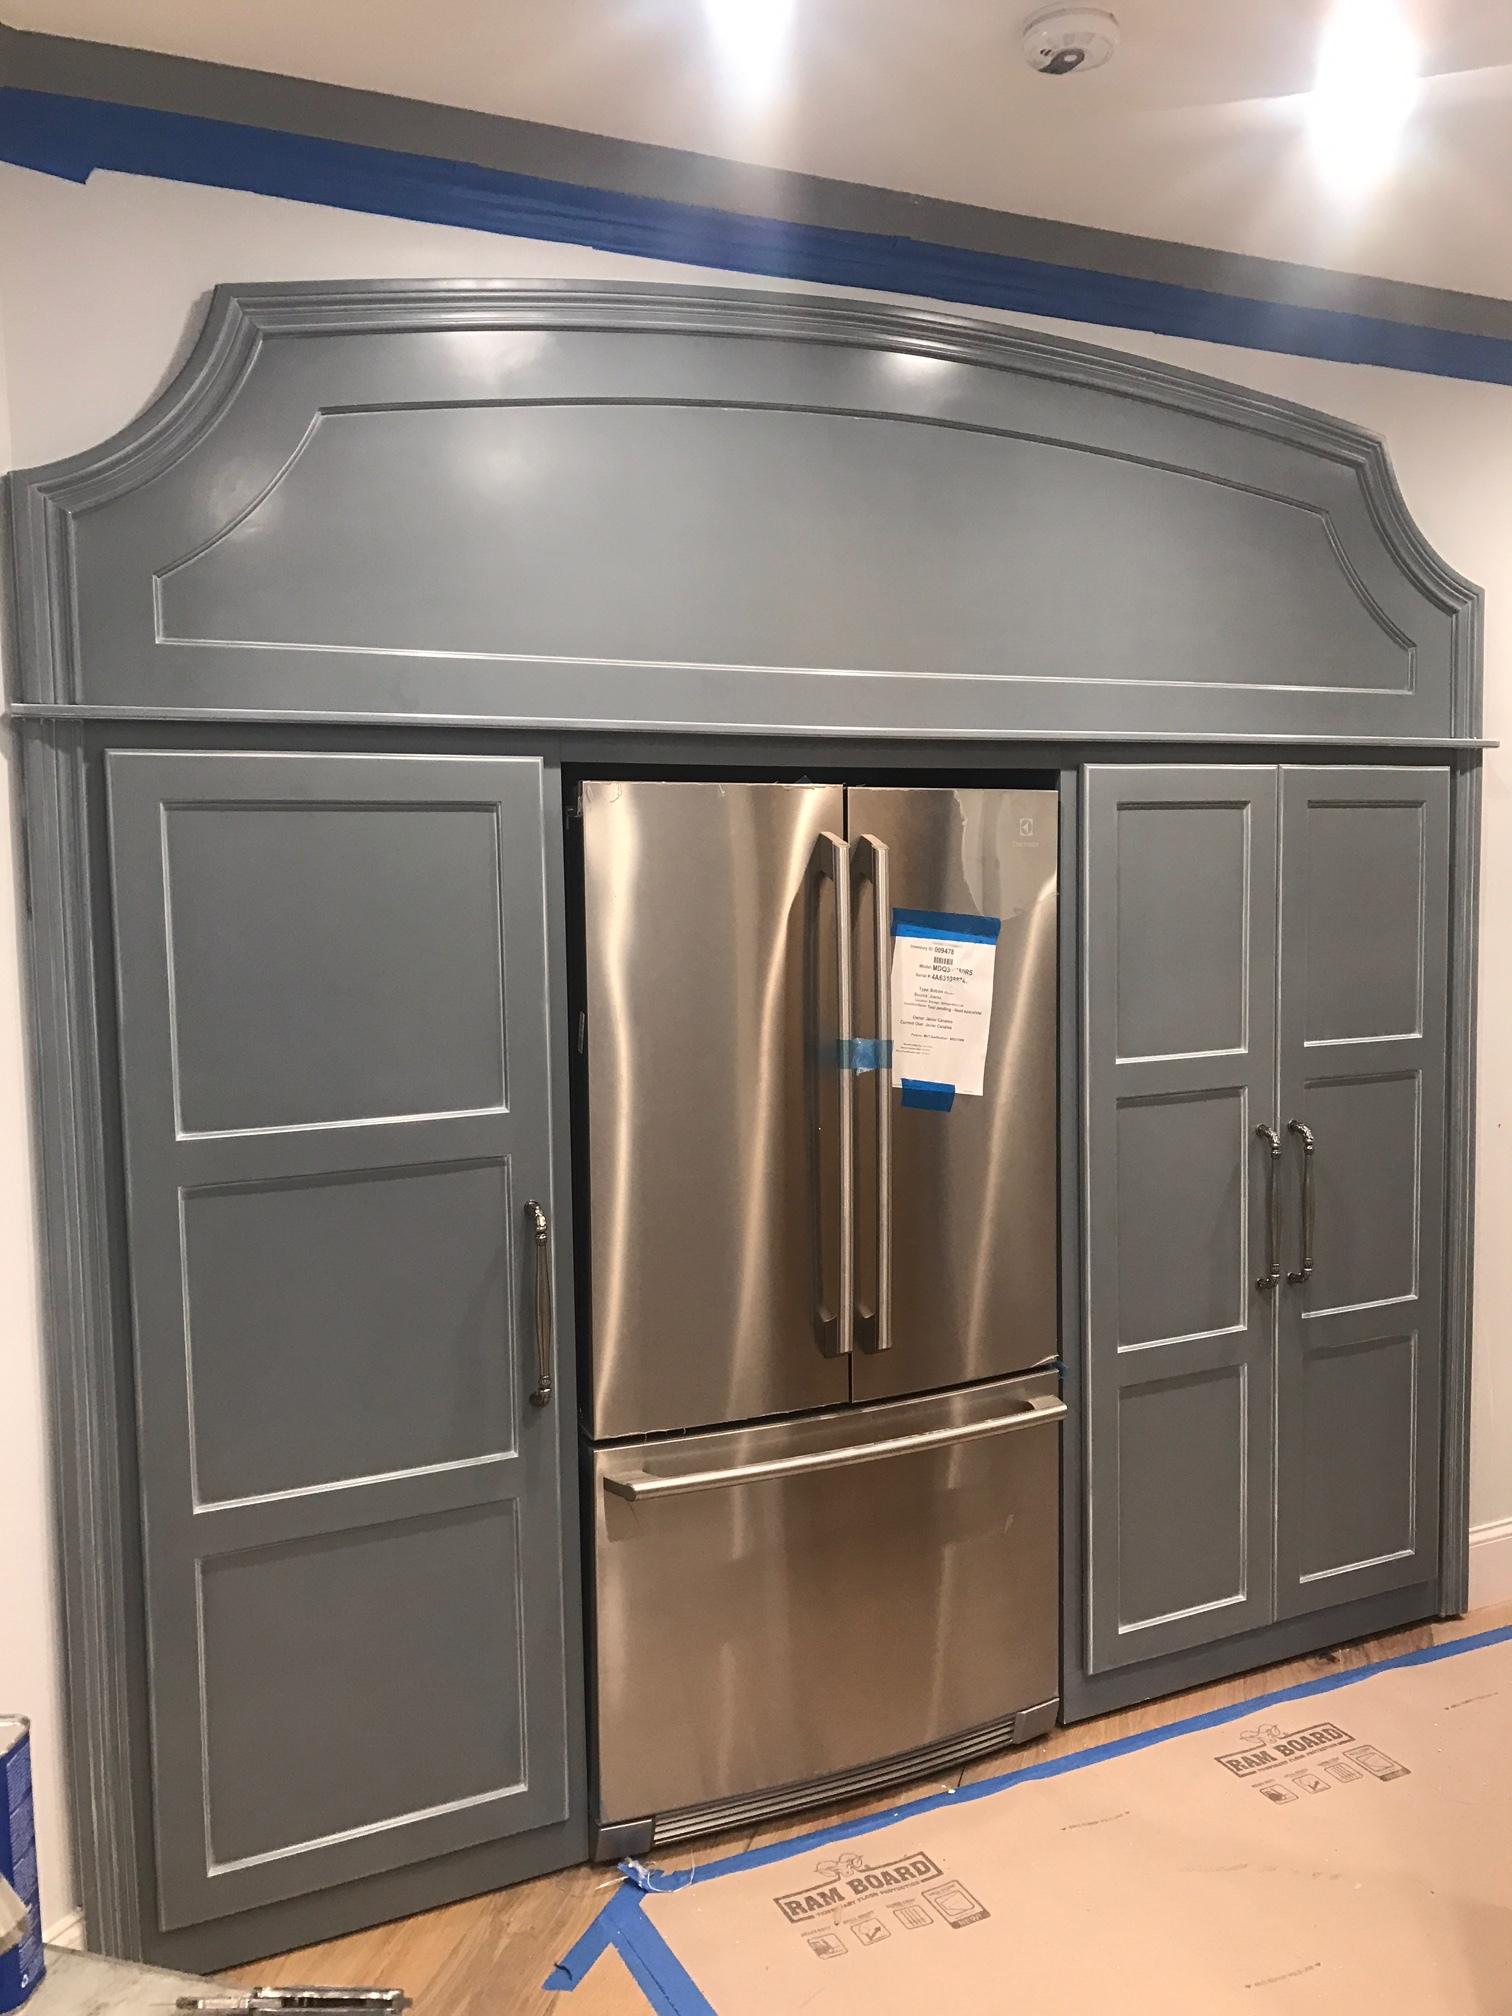 C. Ferguson refrigerator surround.JPG